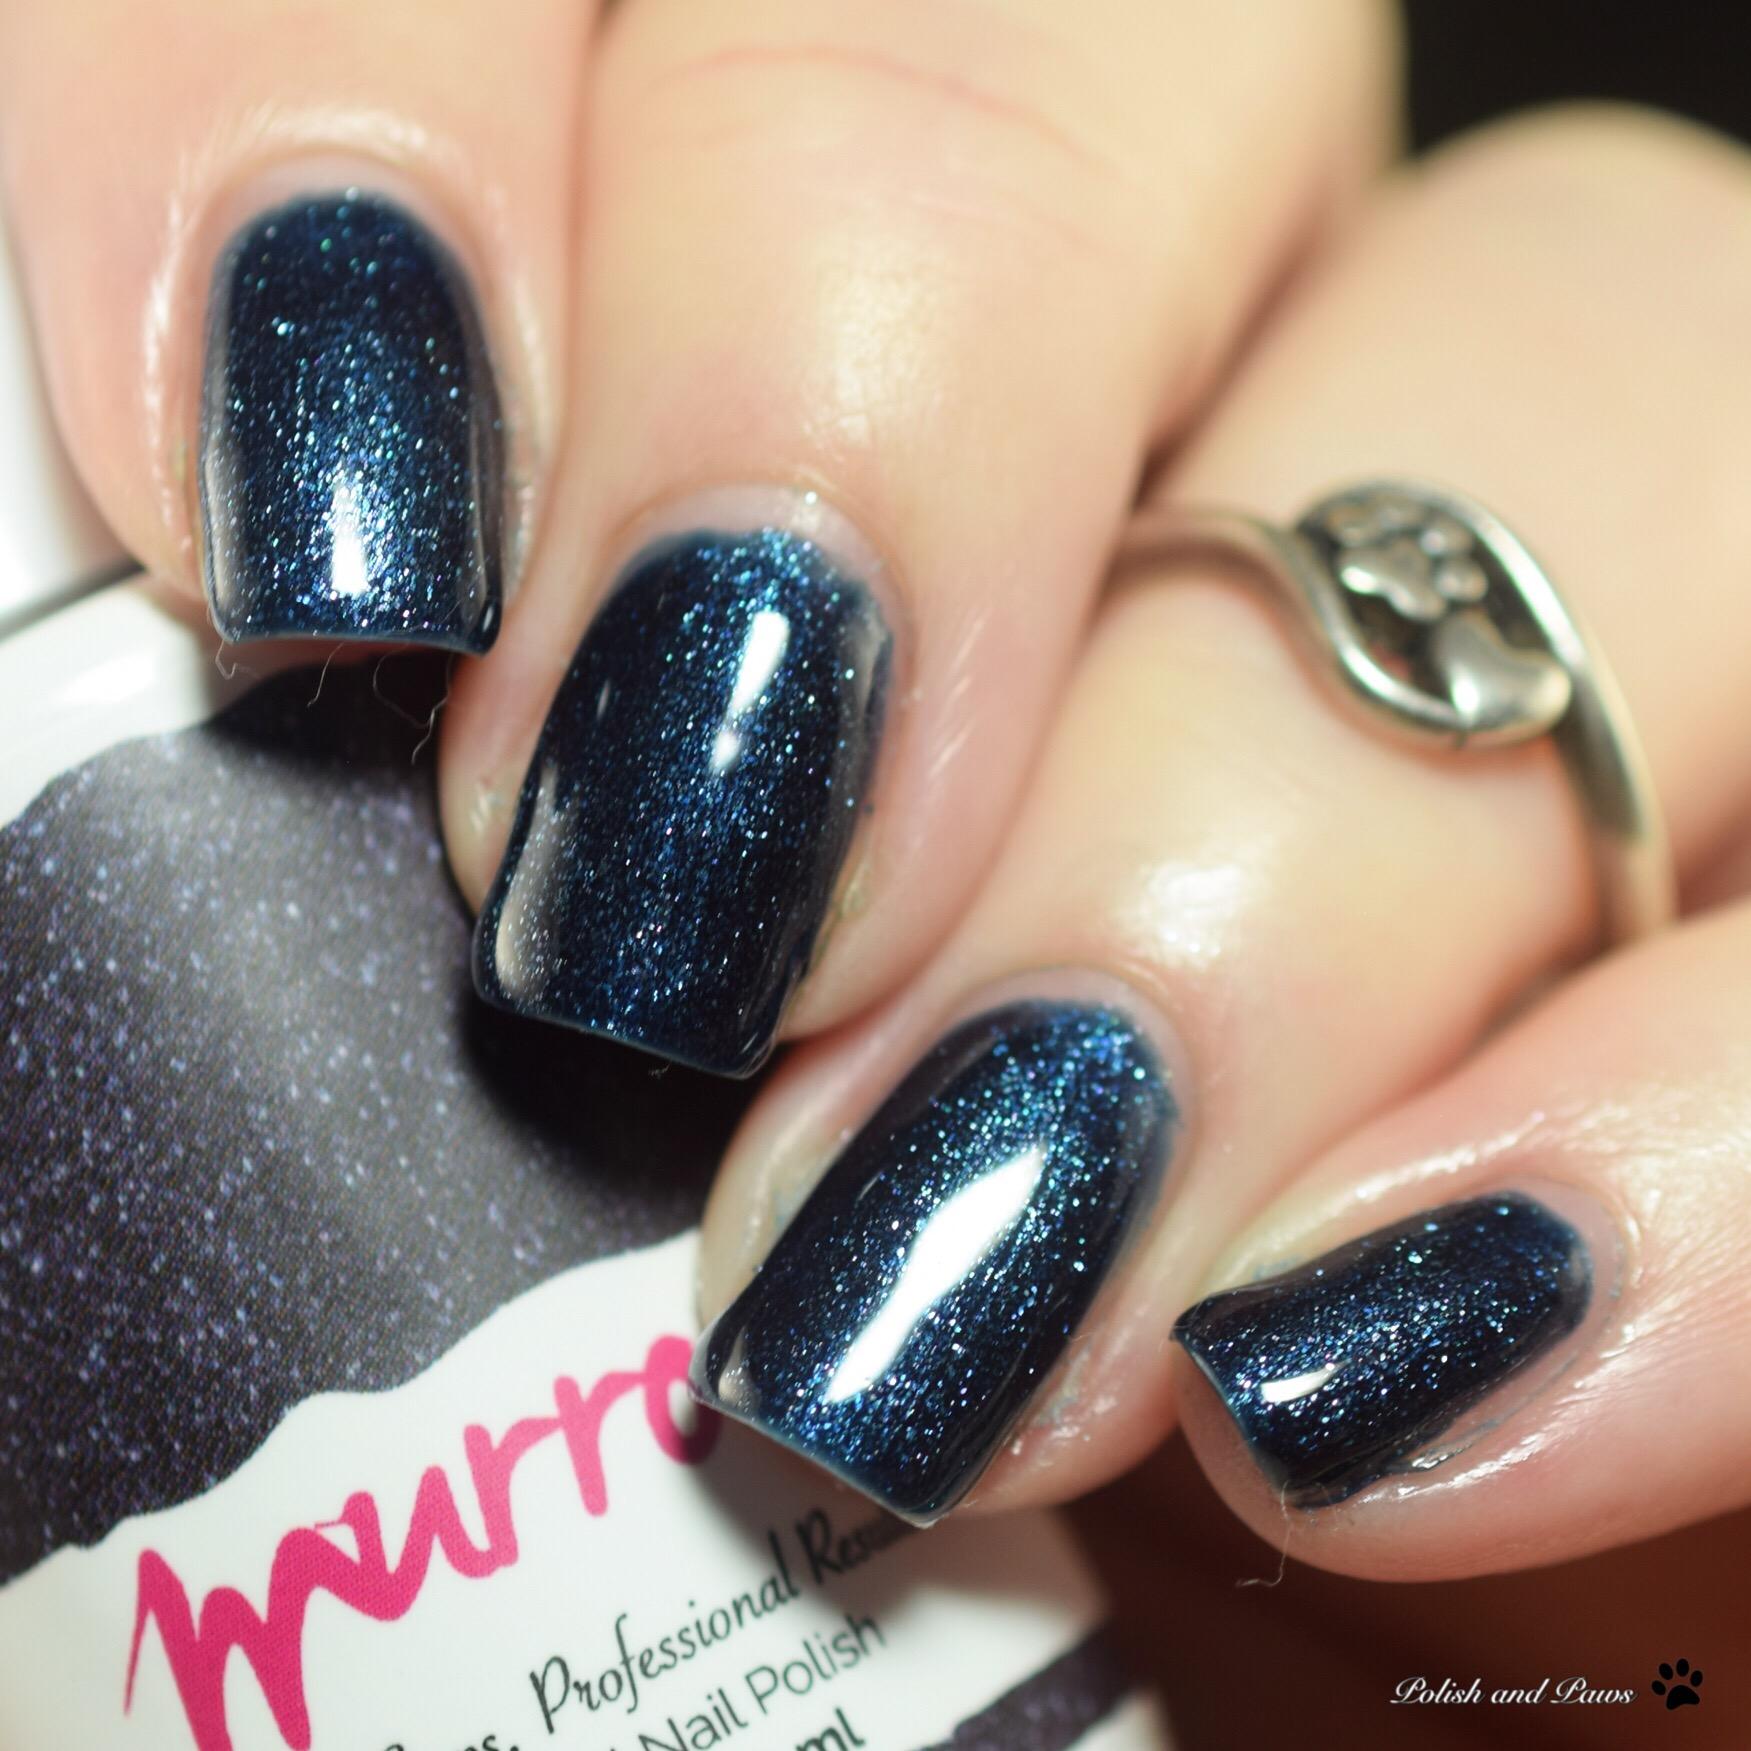 Murron Peel Off Gel Starry Night